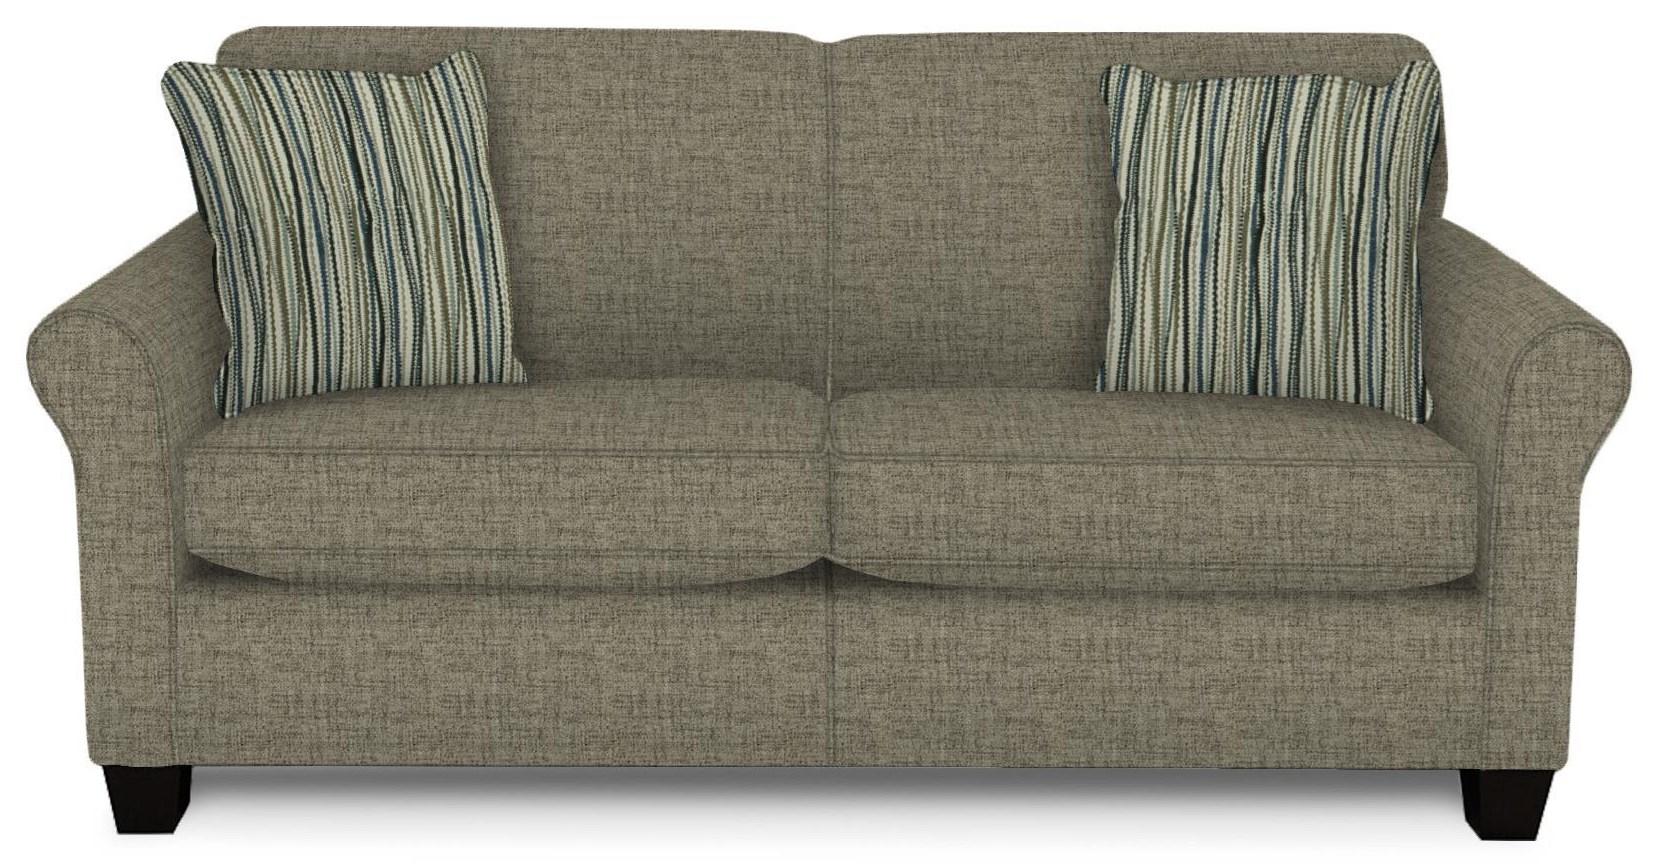 Decker Full Sleeper Sofa by England at Crowley Furniture & Mattress